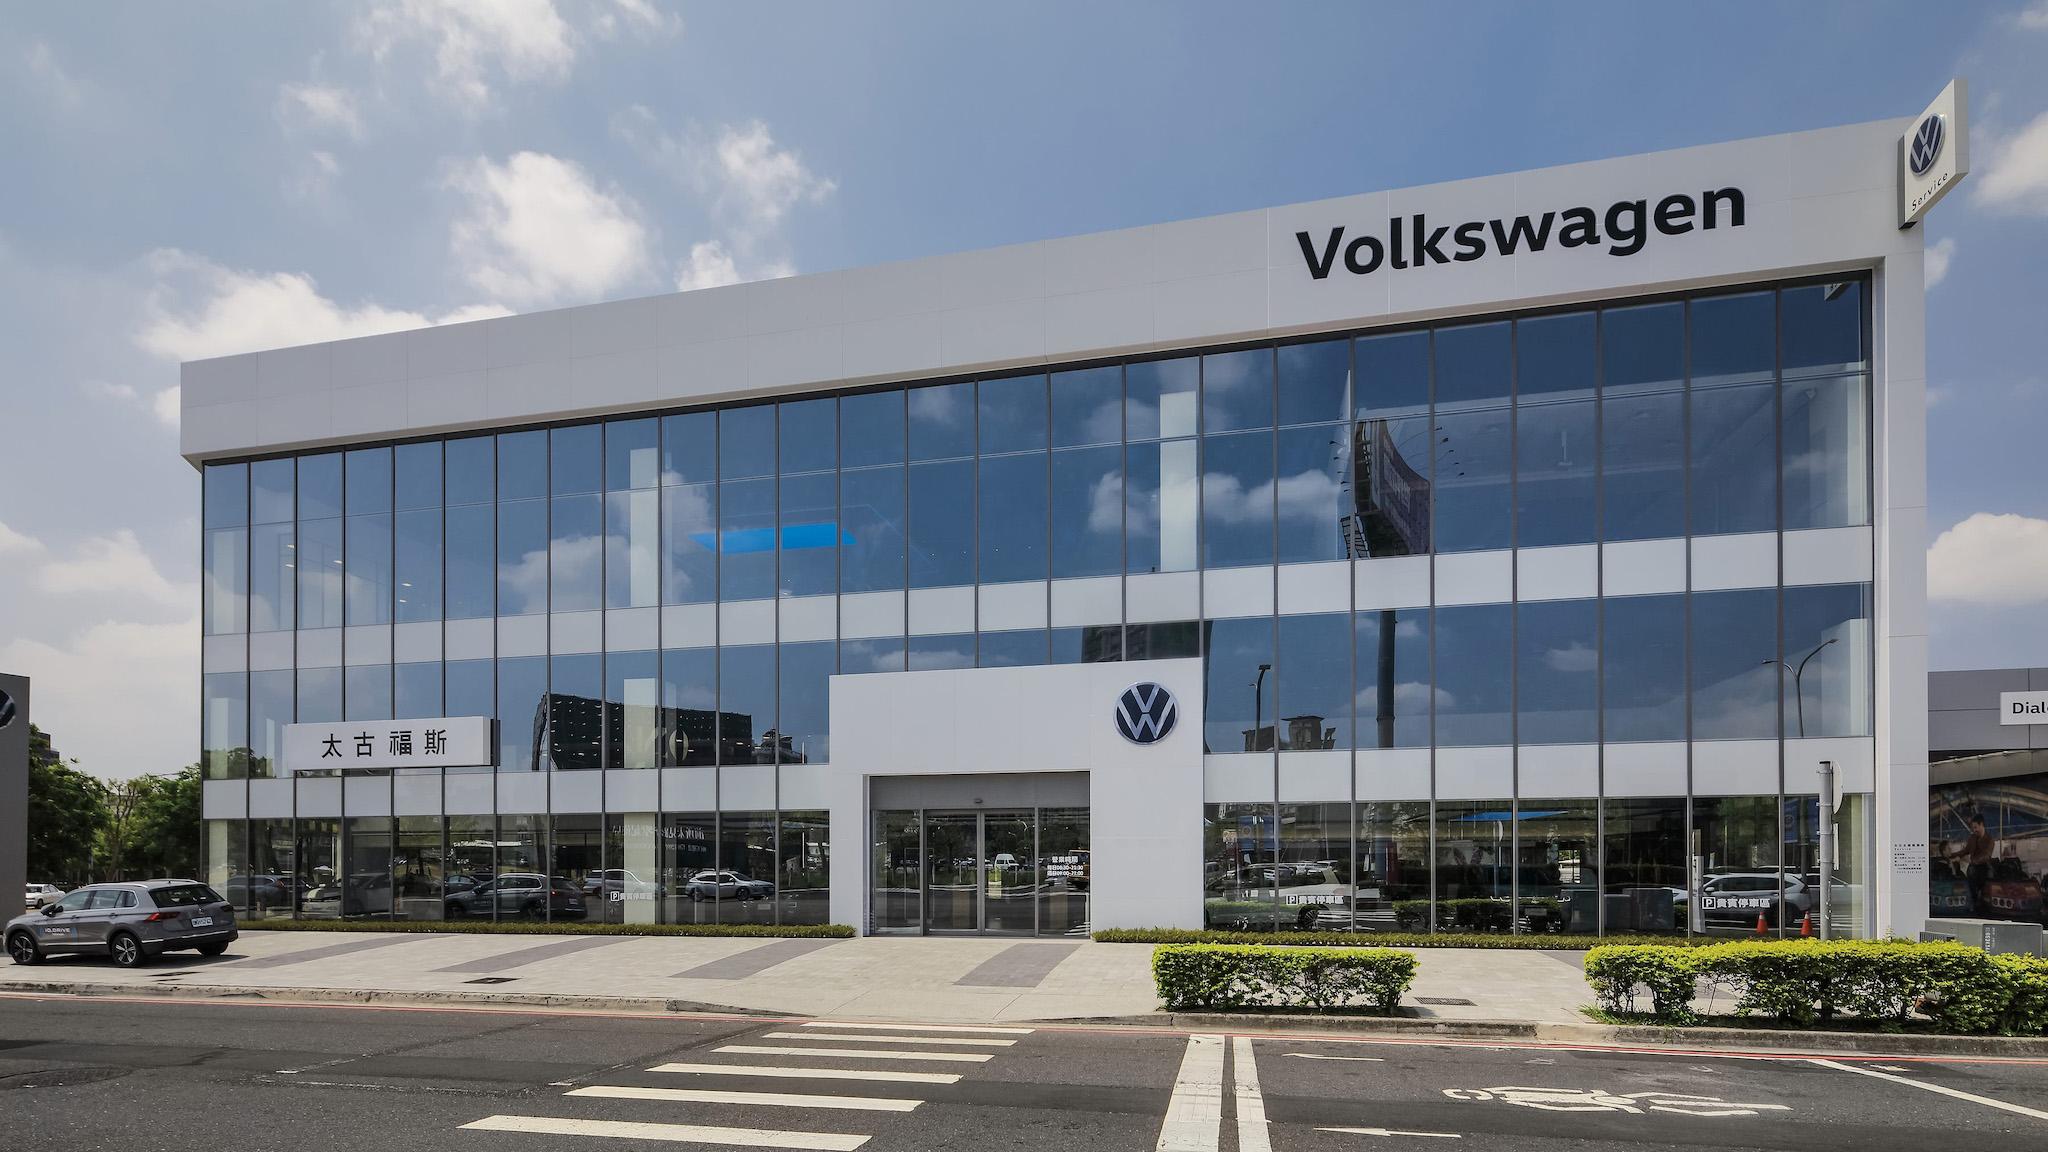 Volkswagen 台中五權正式開幕,全台各展間陸續更新